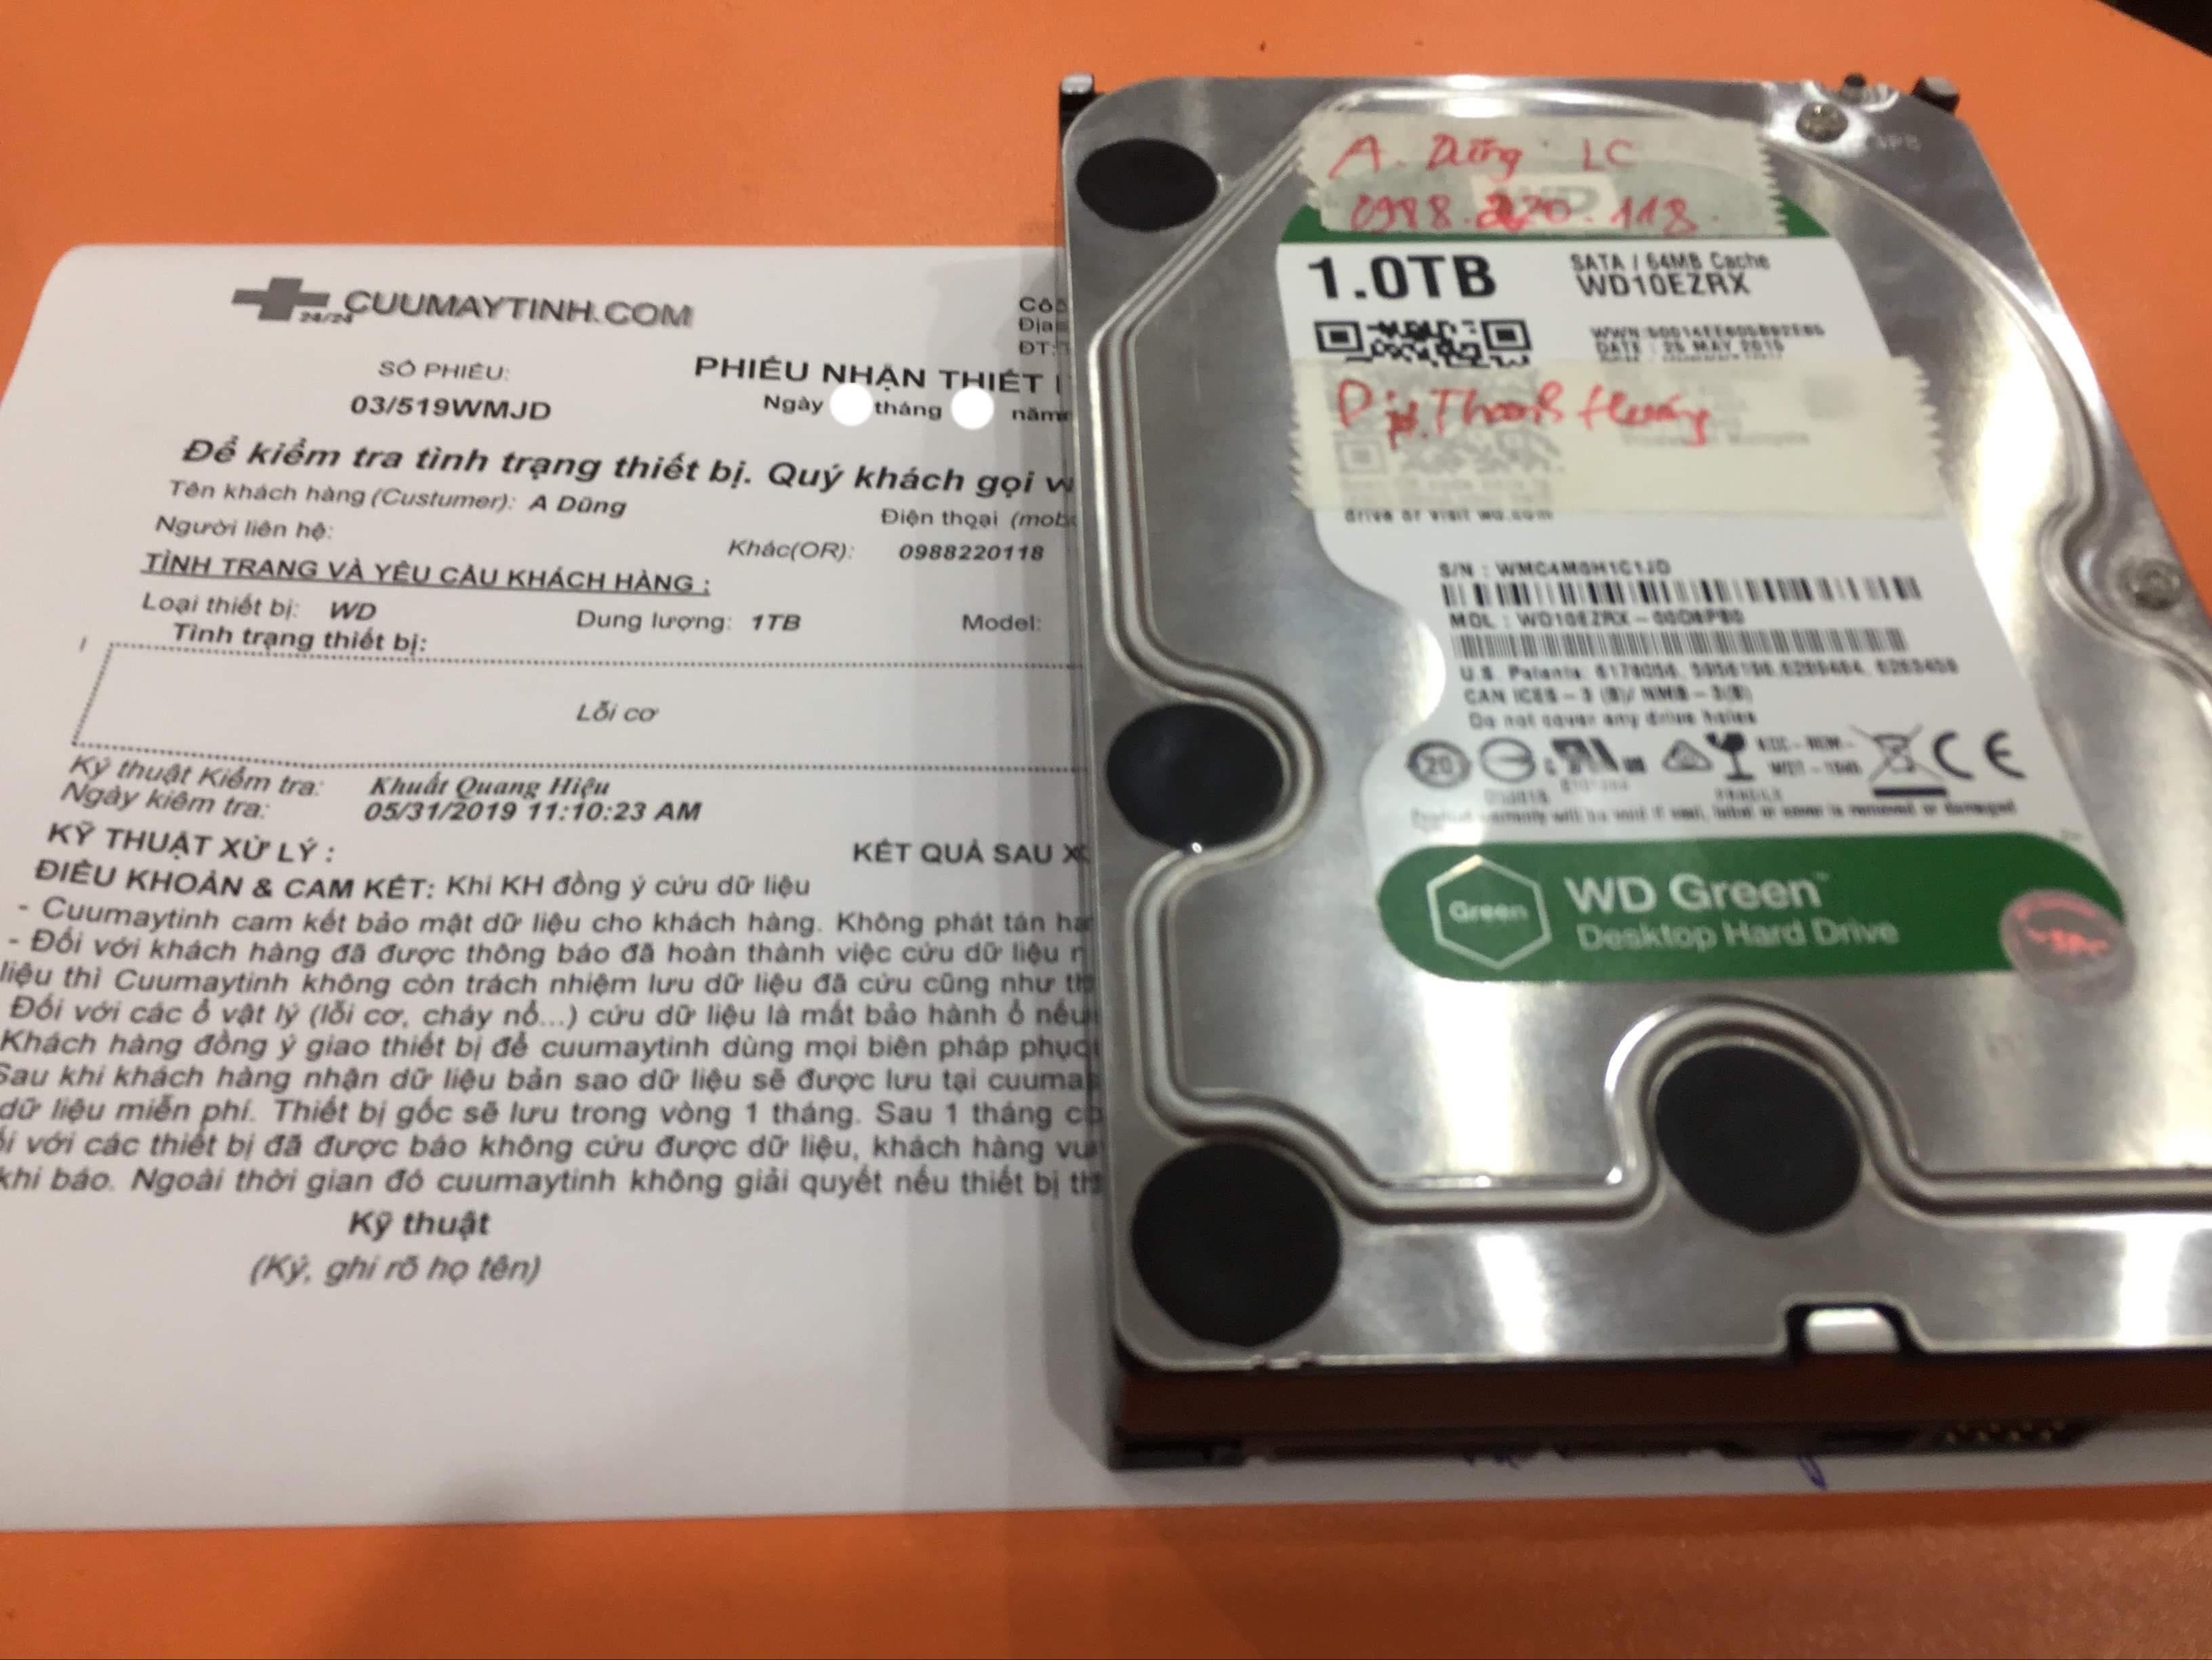 Cứu dữ liệu ổ cứng Western 1TB lỗi cơ  10/06/2019 - cuumaytinh